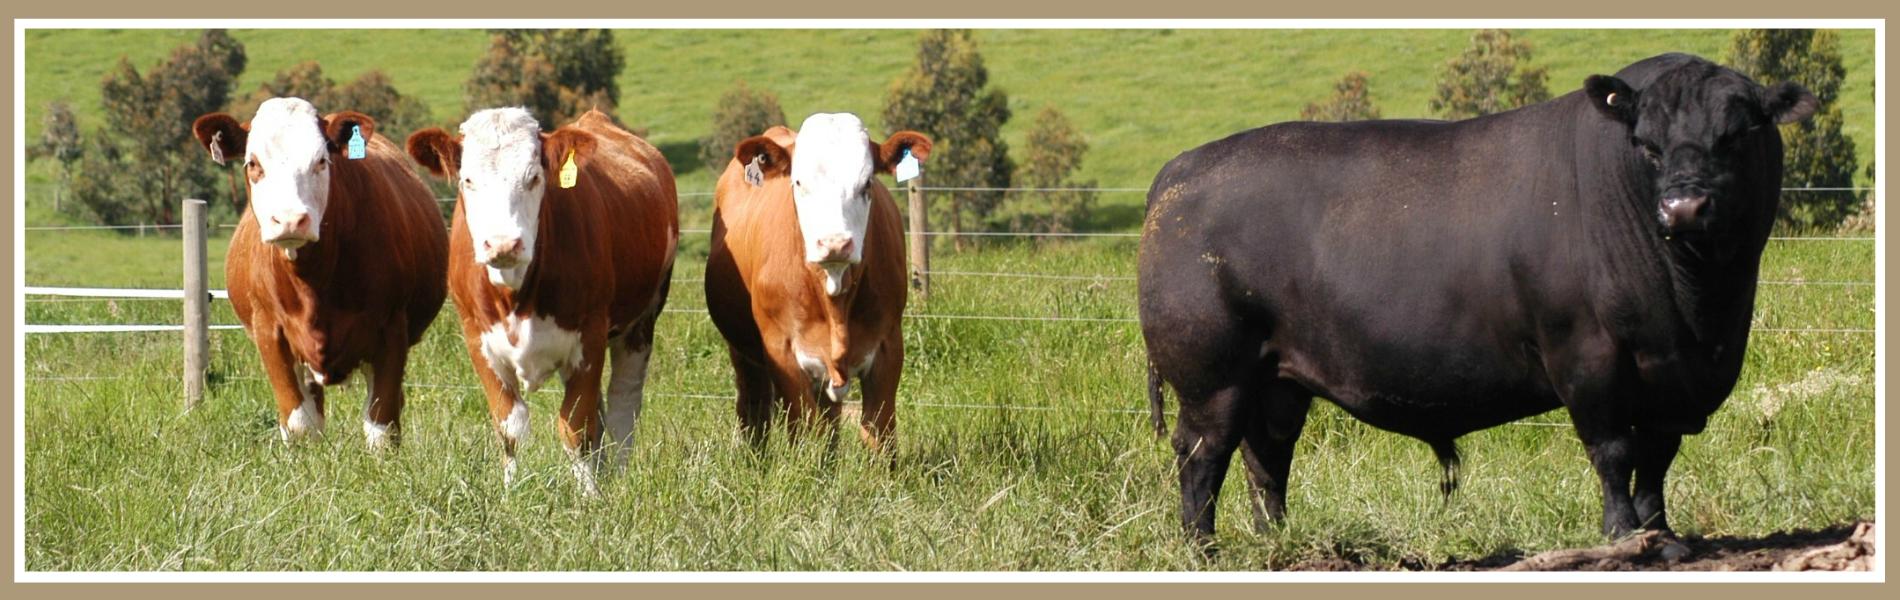 Lowline Cattle Breed Testimonials